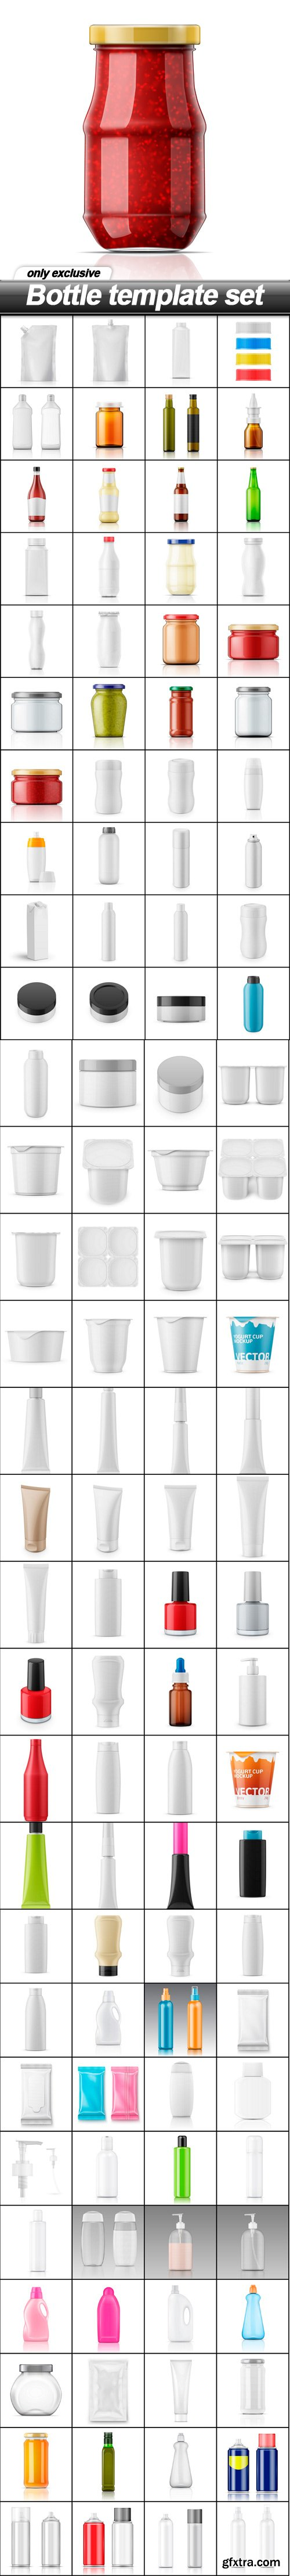 Bottle template set - 117 EPS